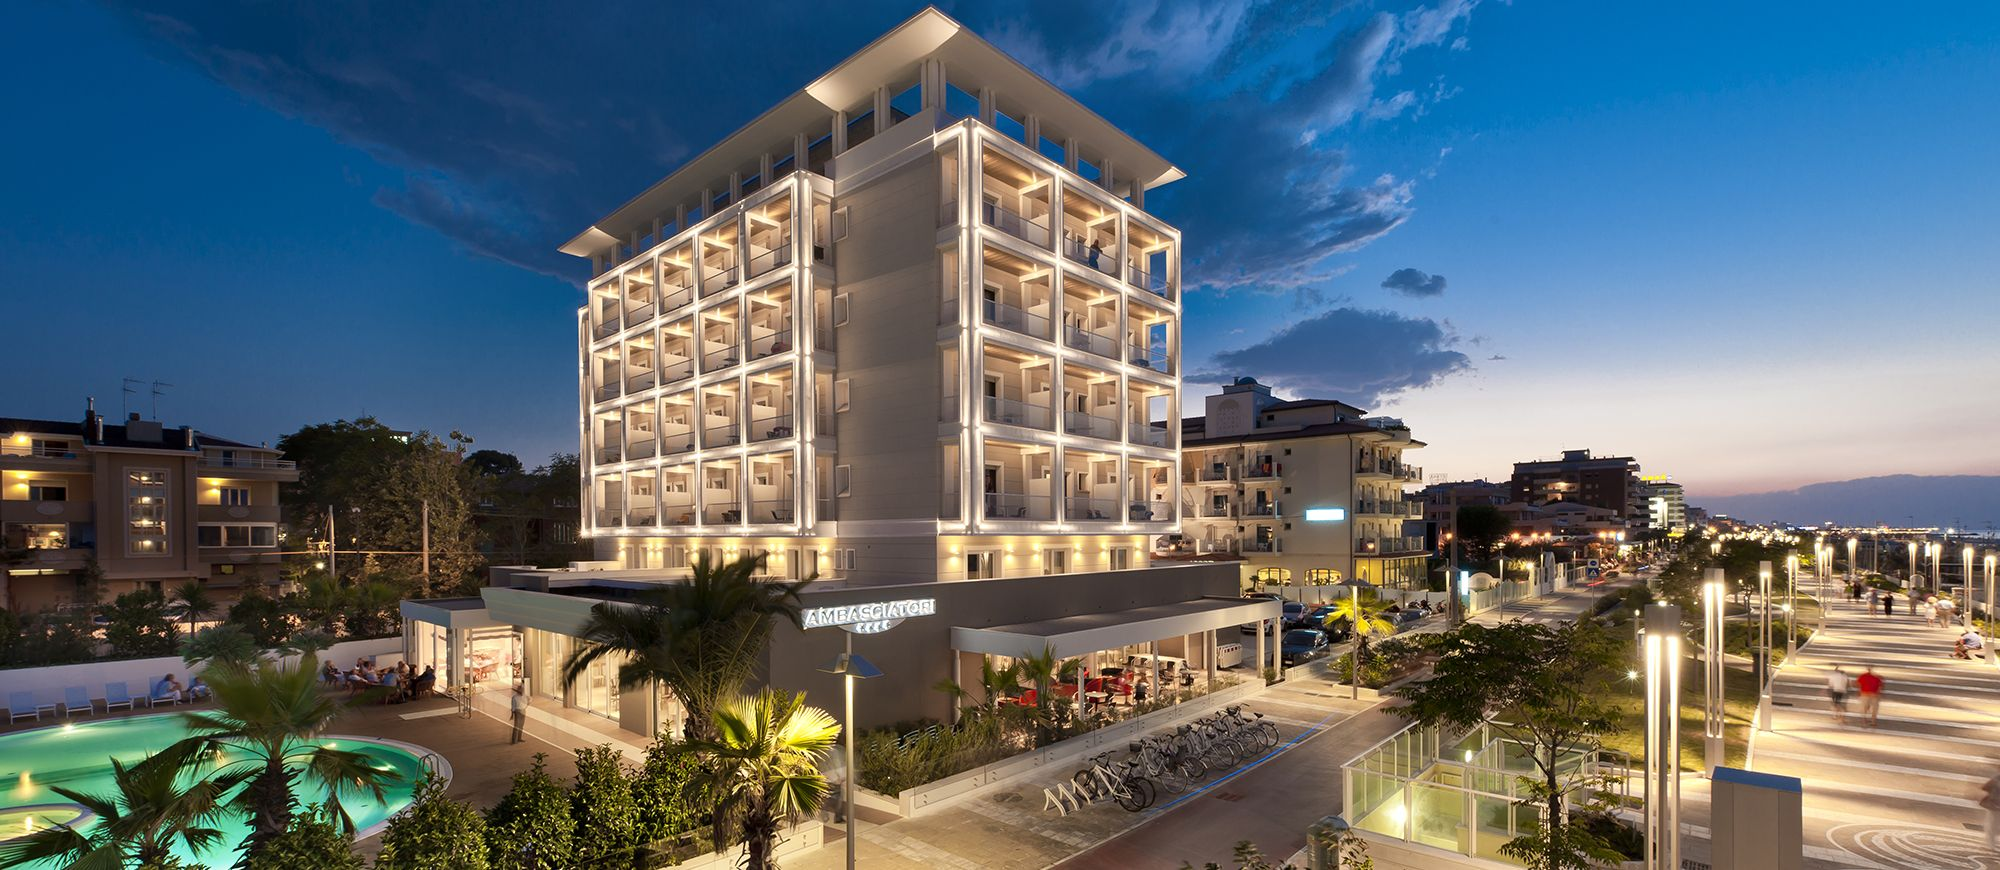 Bellaria Hotel  Stelle Sul Mare